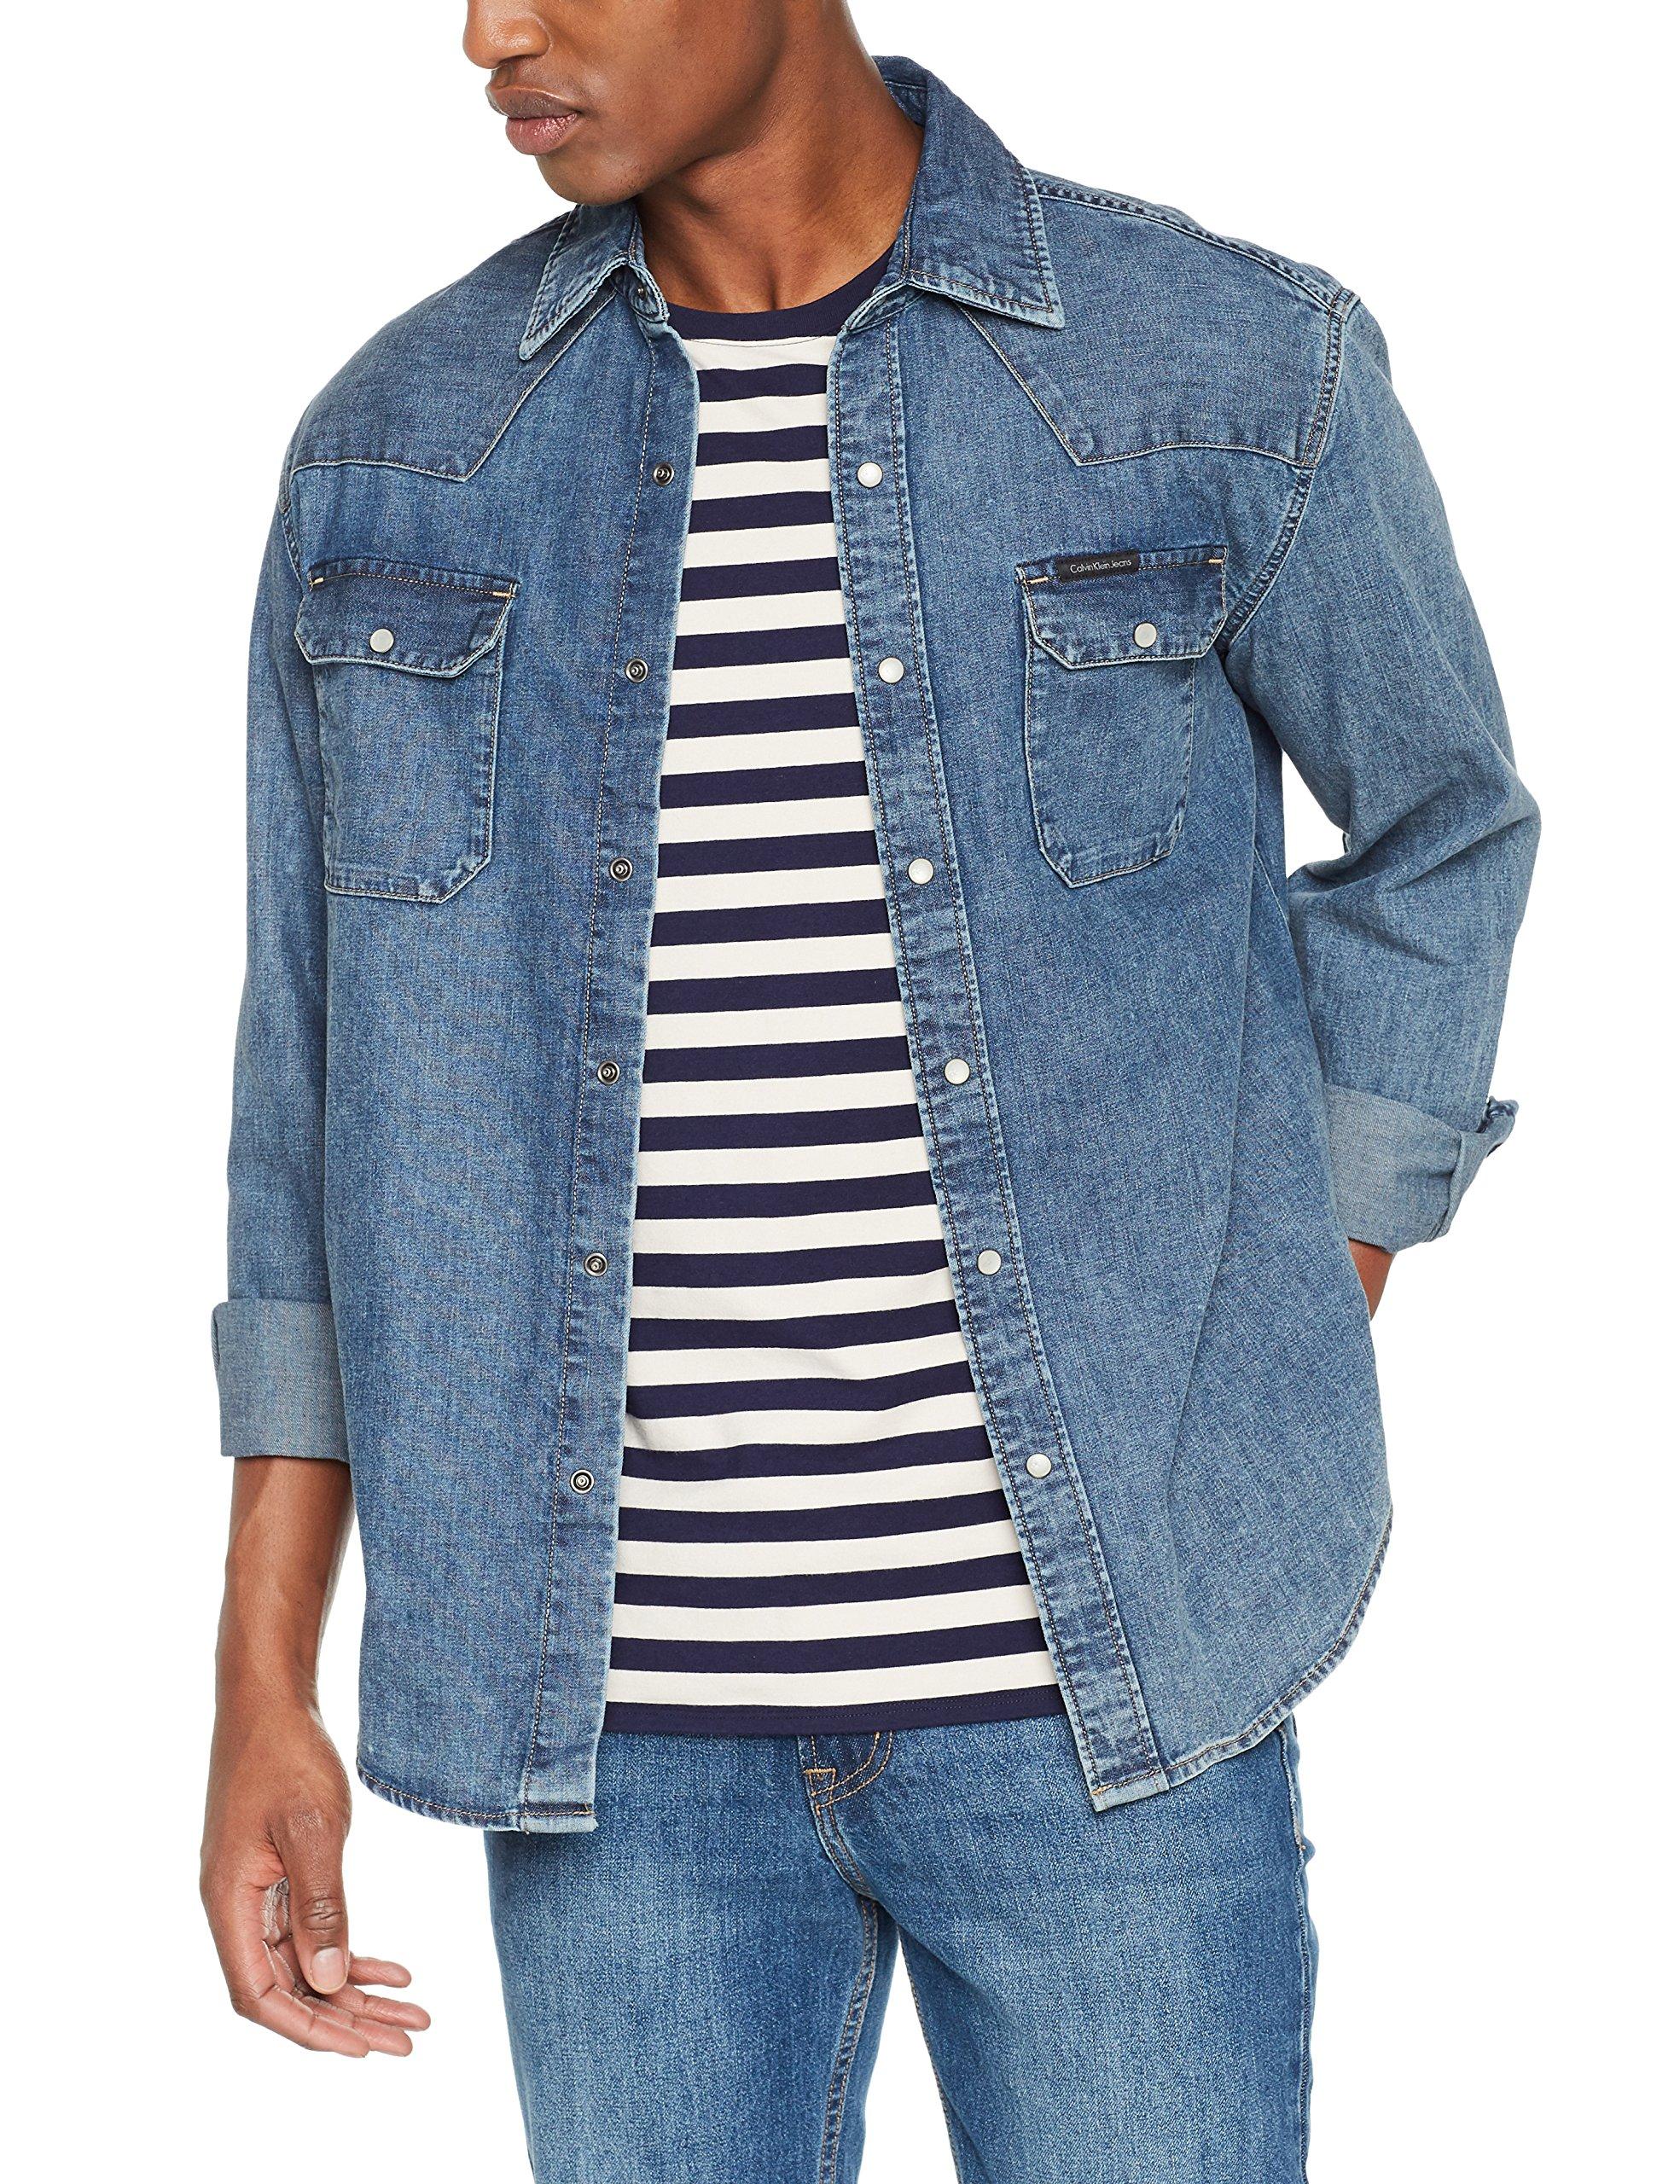 Chemise Calvin Homme CasualBleu Klein Archive soho Blue 911Medium Western Jeans TwZuOXPki